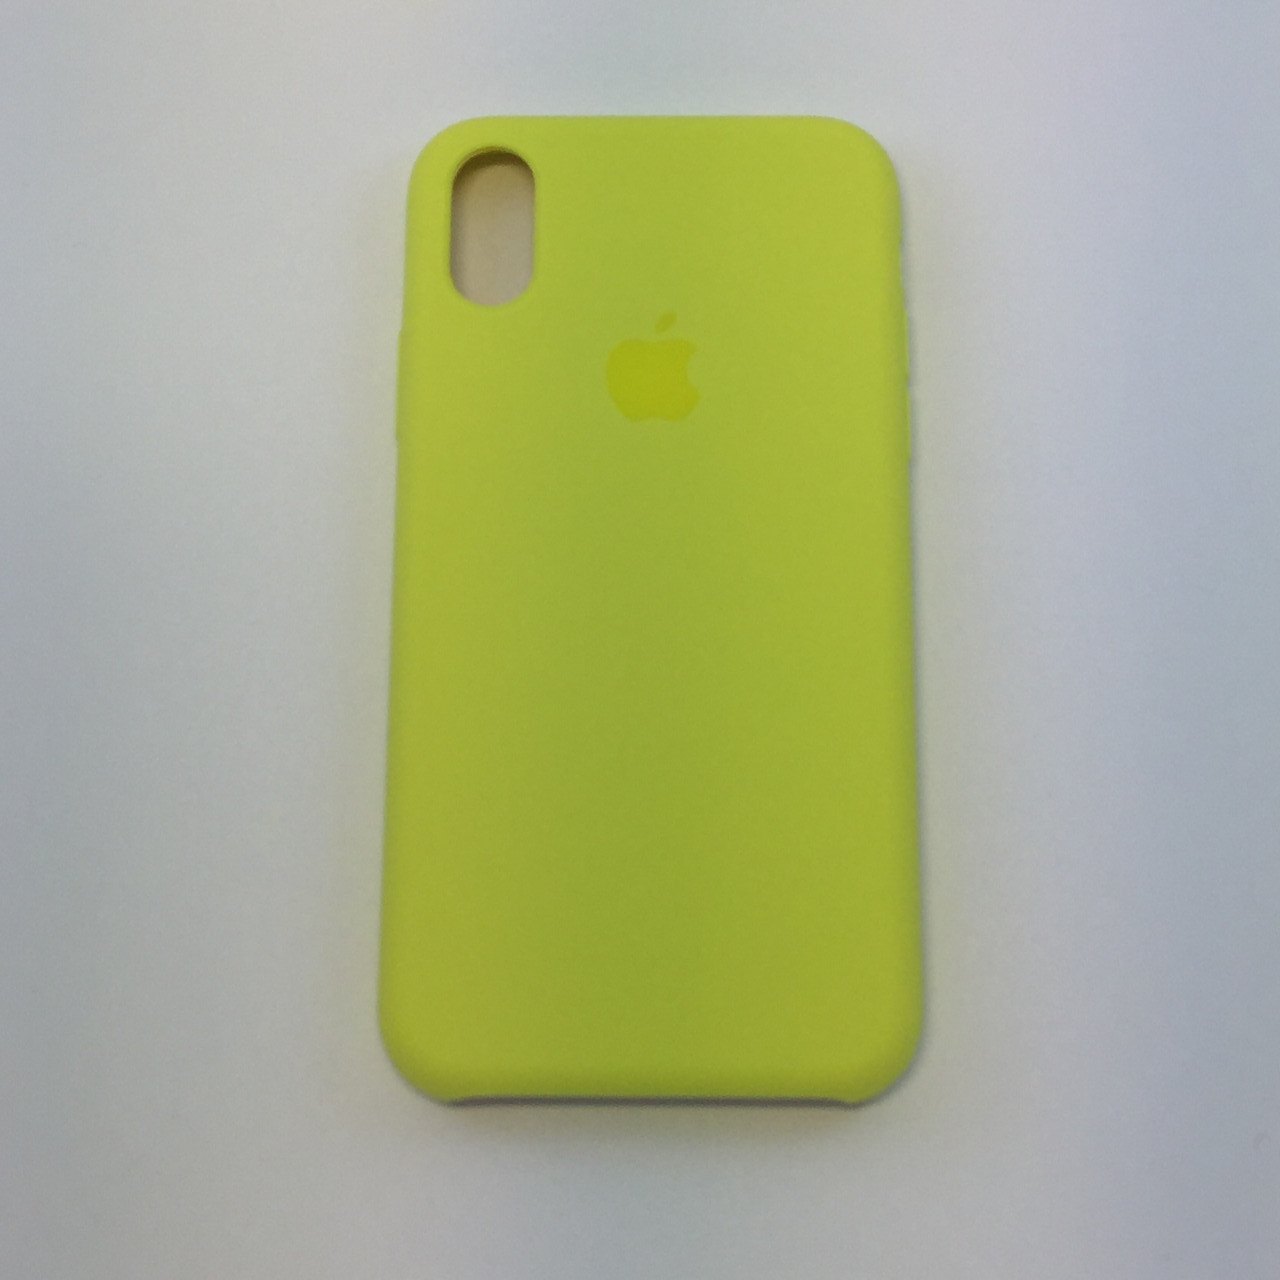 "Чехол - Silicon Case для iPhone ""Вспышка - №32"" - copy orig."